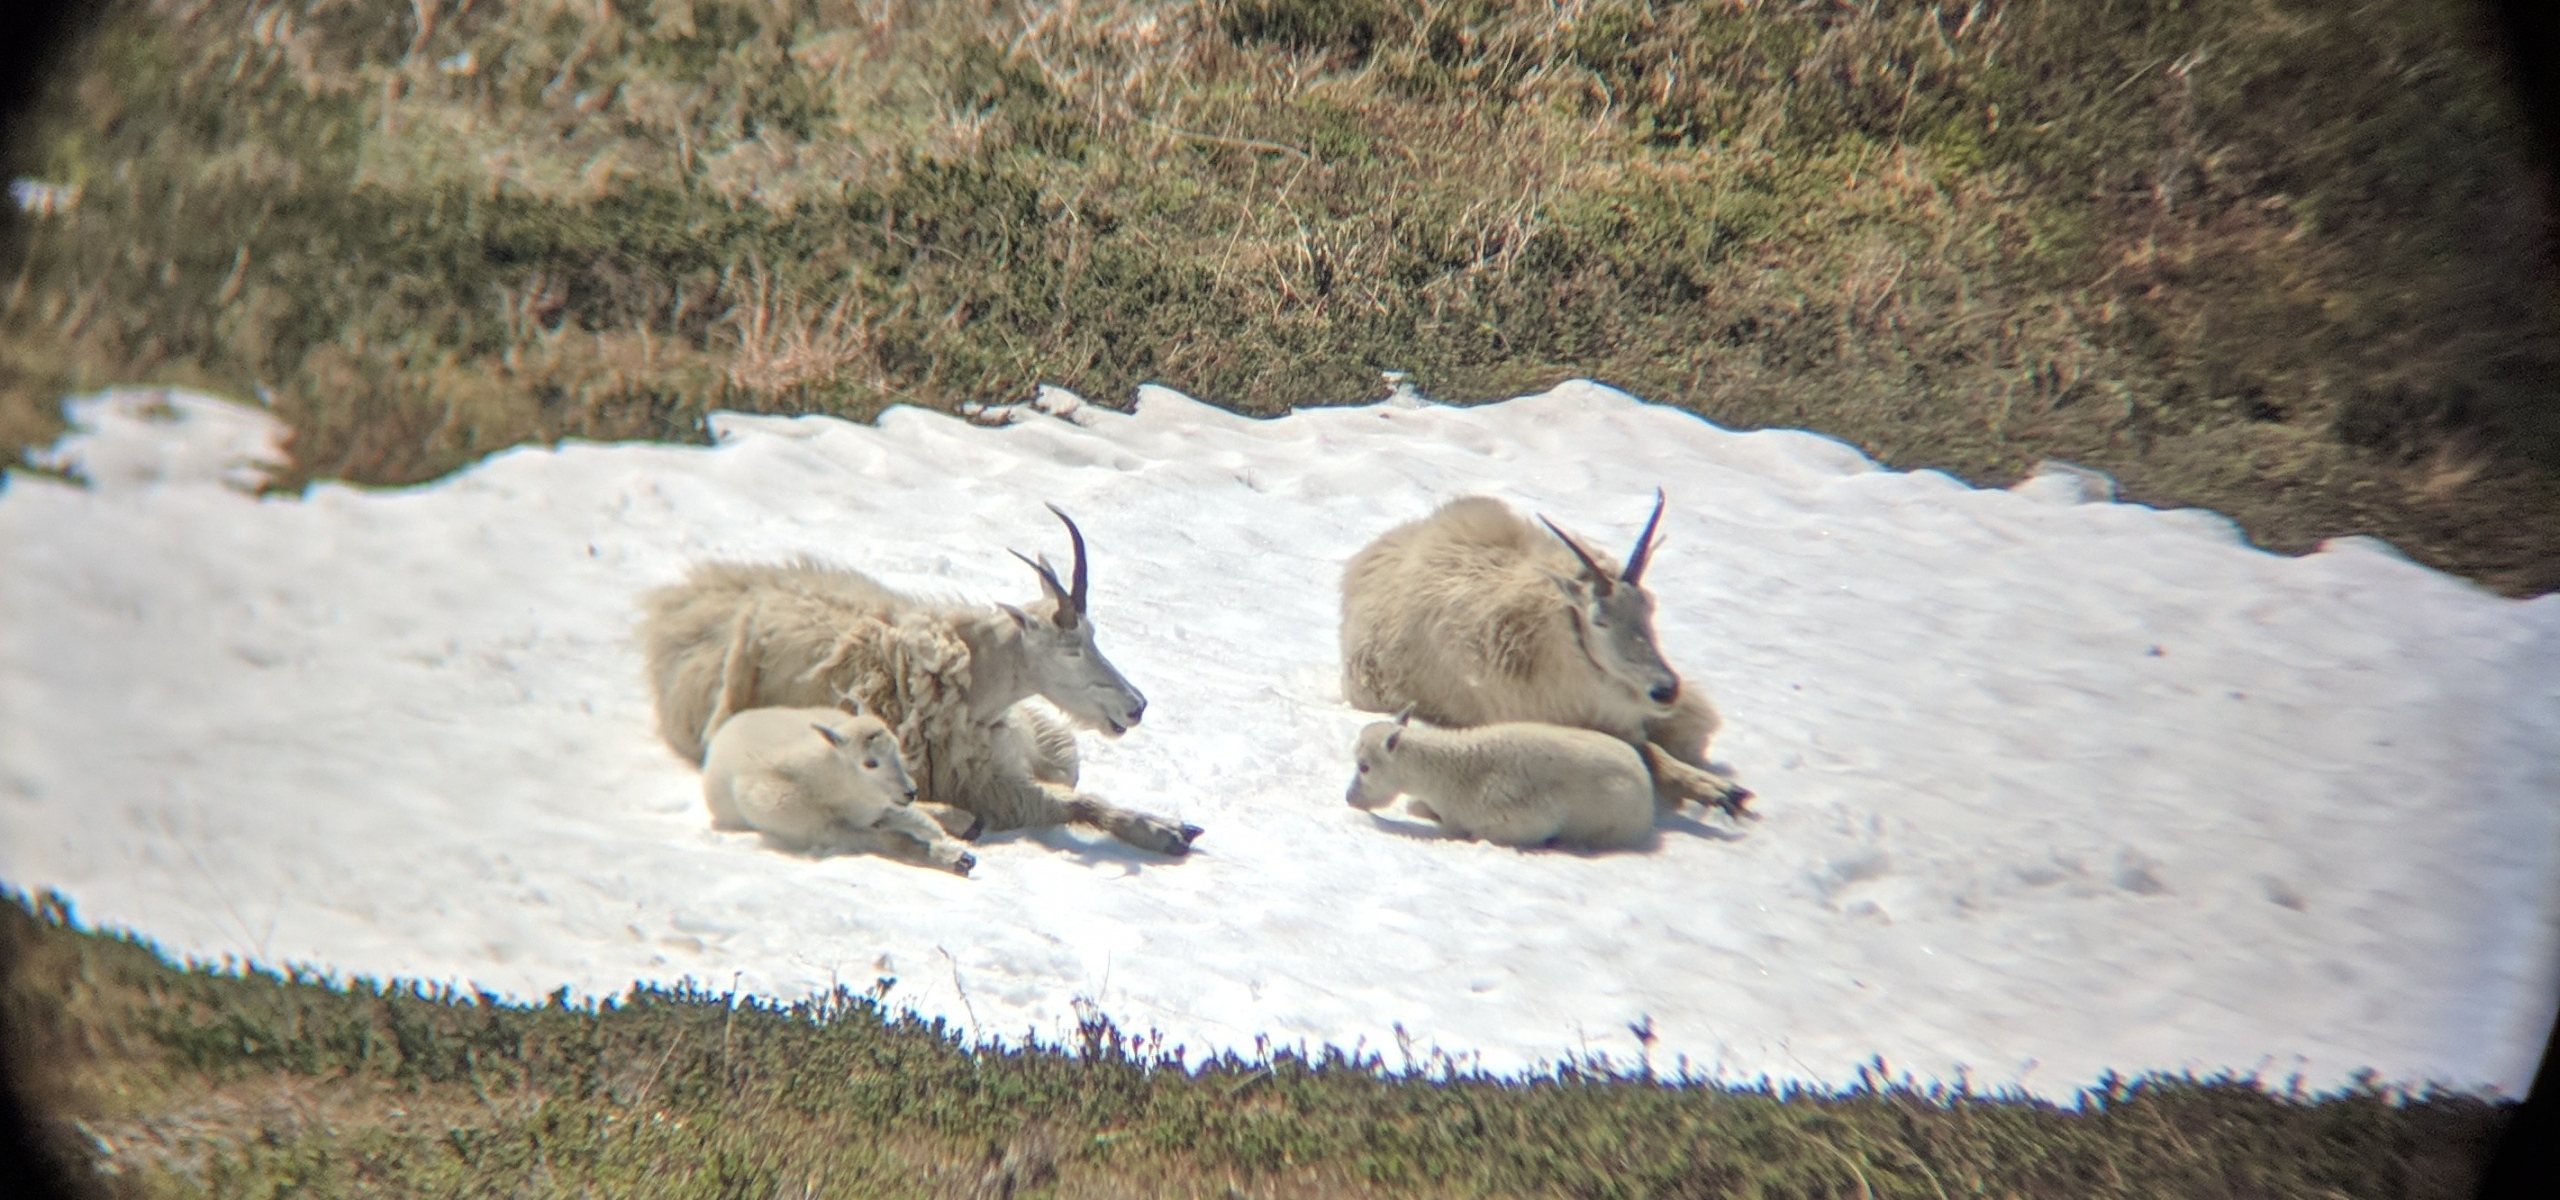 Mountain Goats through binoculars harding icefield trail hike seward alaska kenai fjords national park